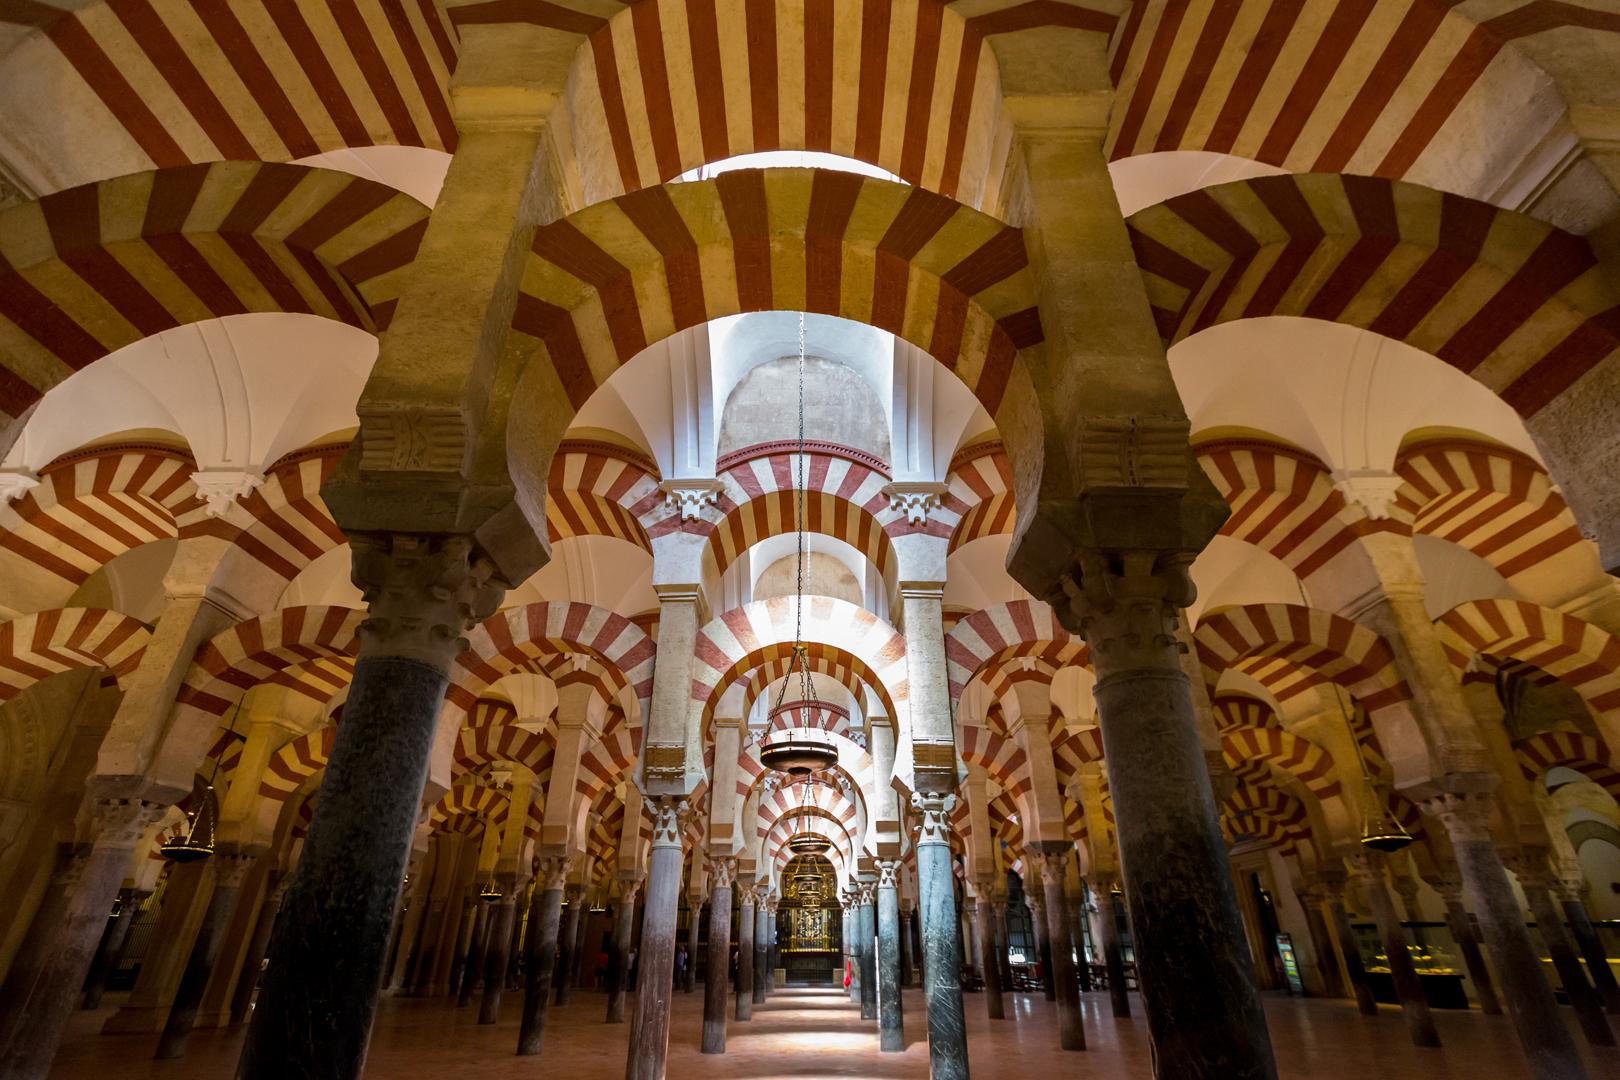 Mezquita Catedral - Cordoba free tour